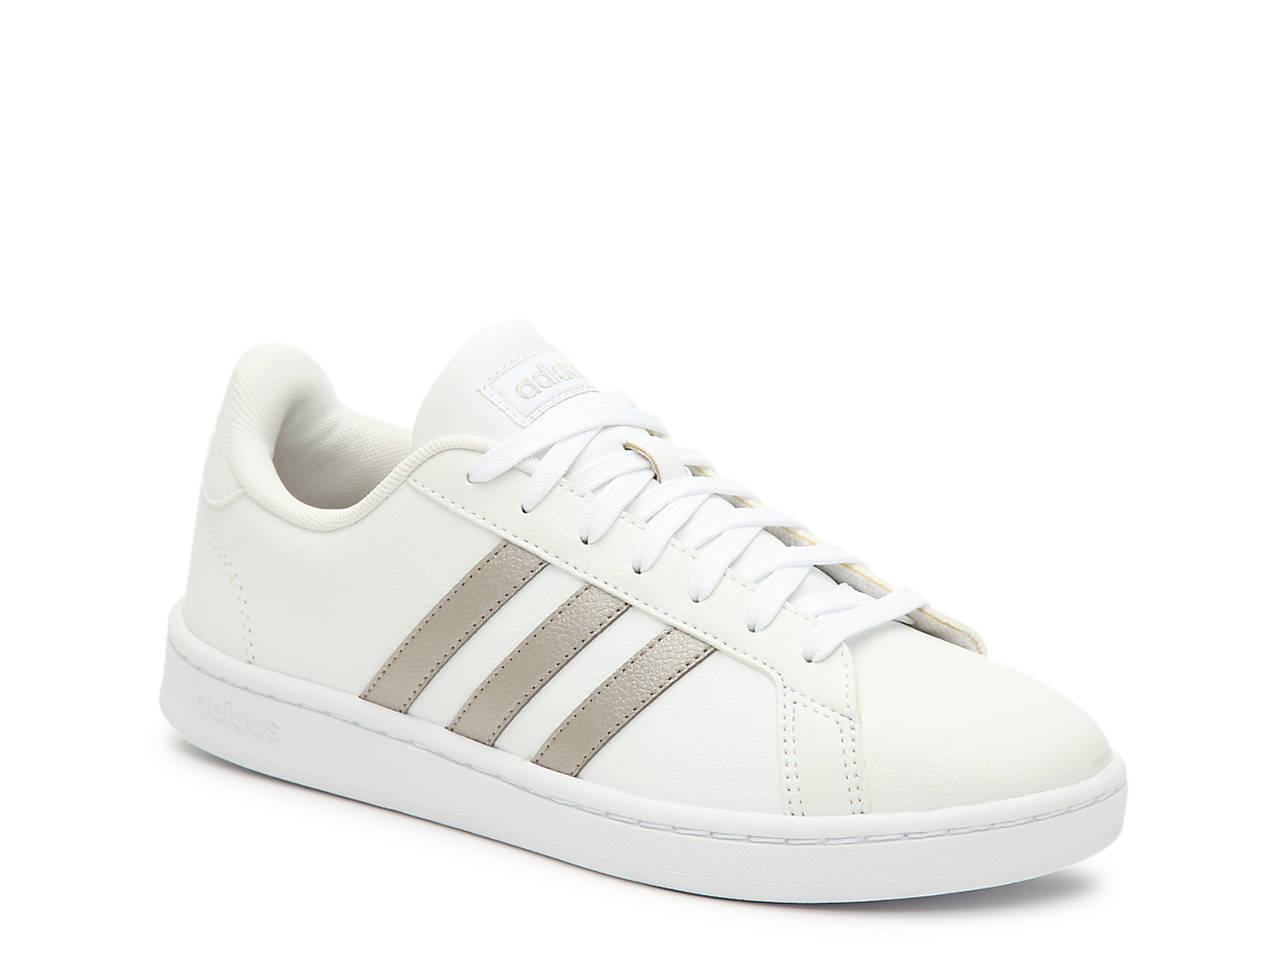 cd4eb59f2e6 adidas Grand Court Sneaker - Women's Women's Shoes | DSW